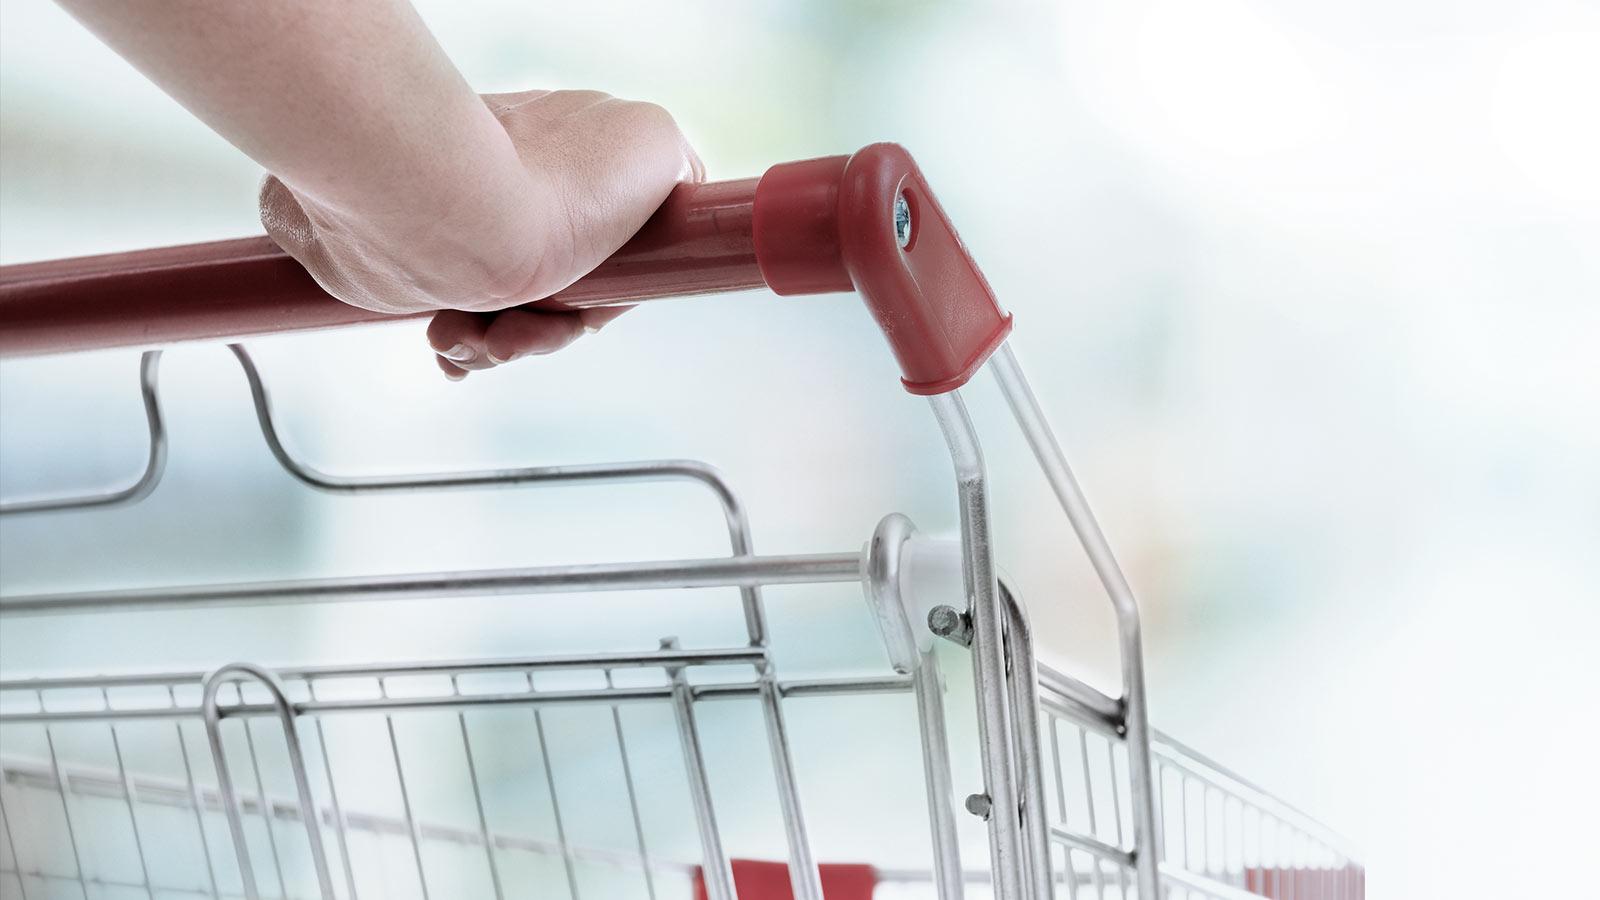 Handel und Konsumgüter